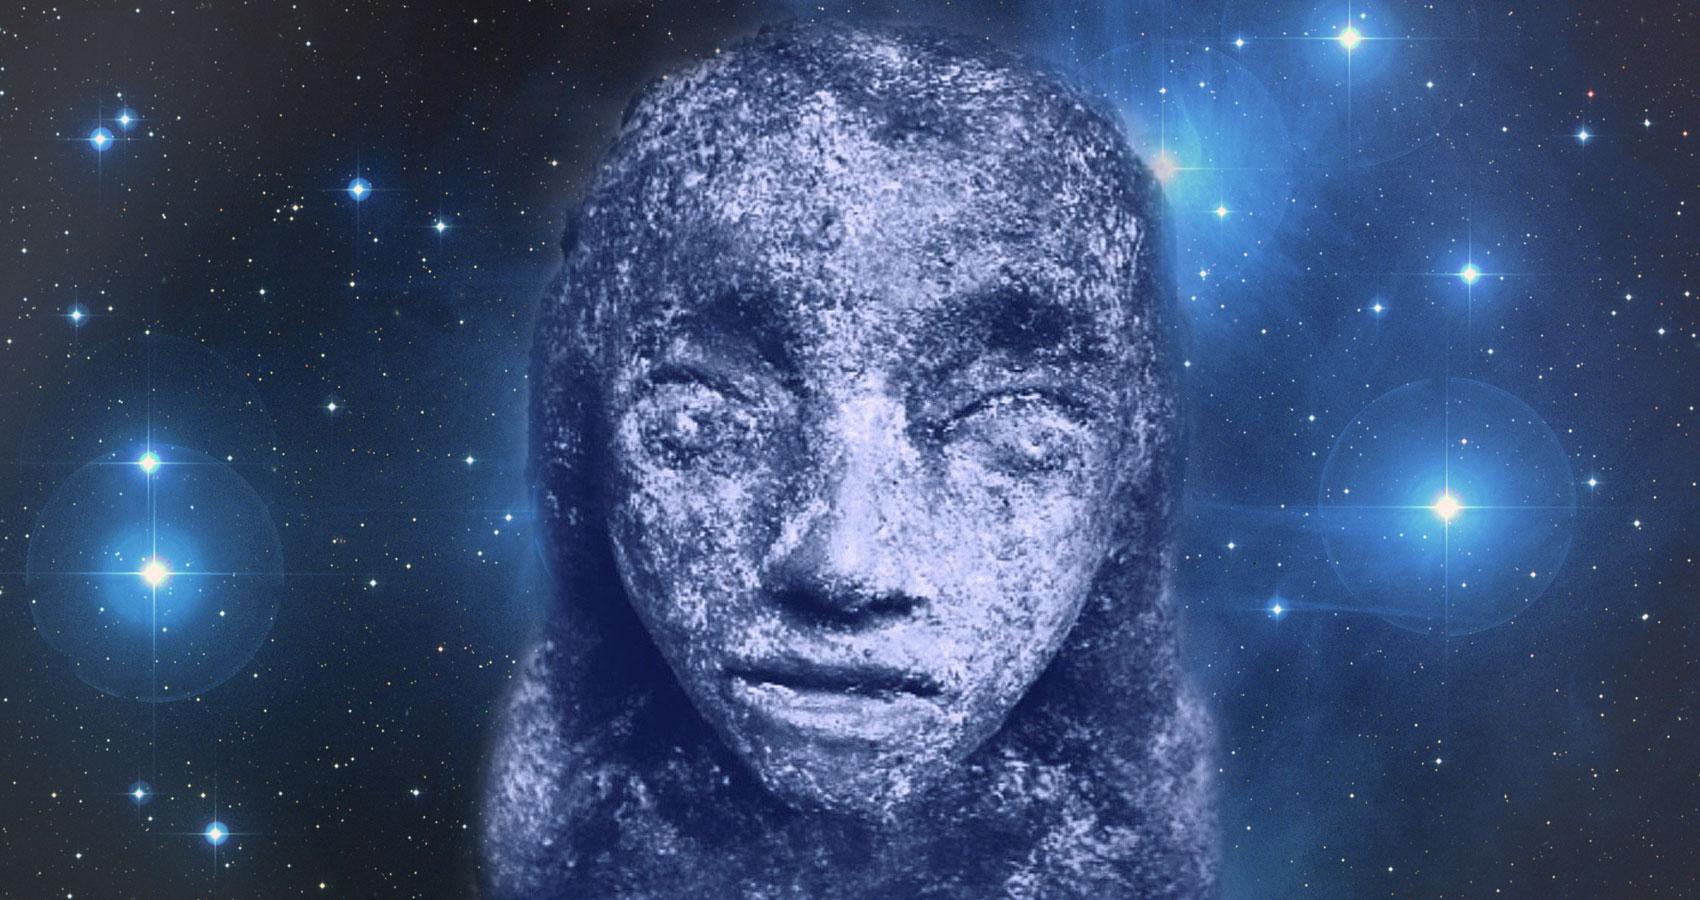 Watchman Of The Night, written by Allison Grayhurstat Spillwords.com